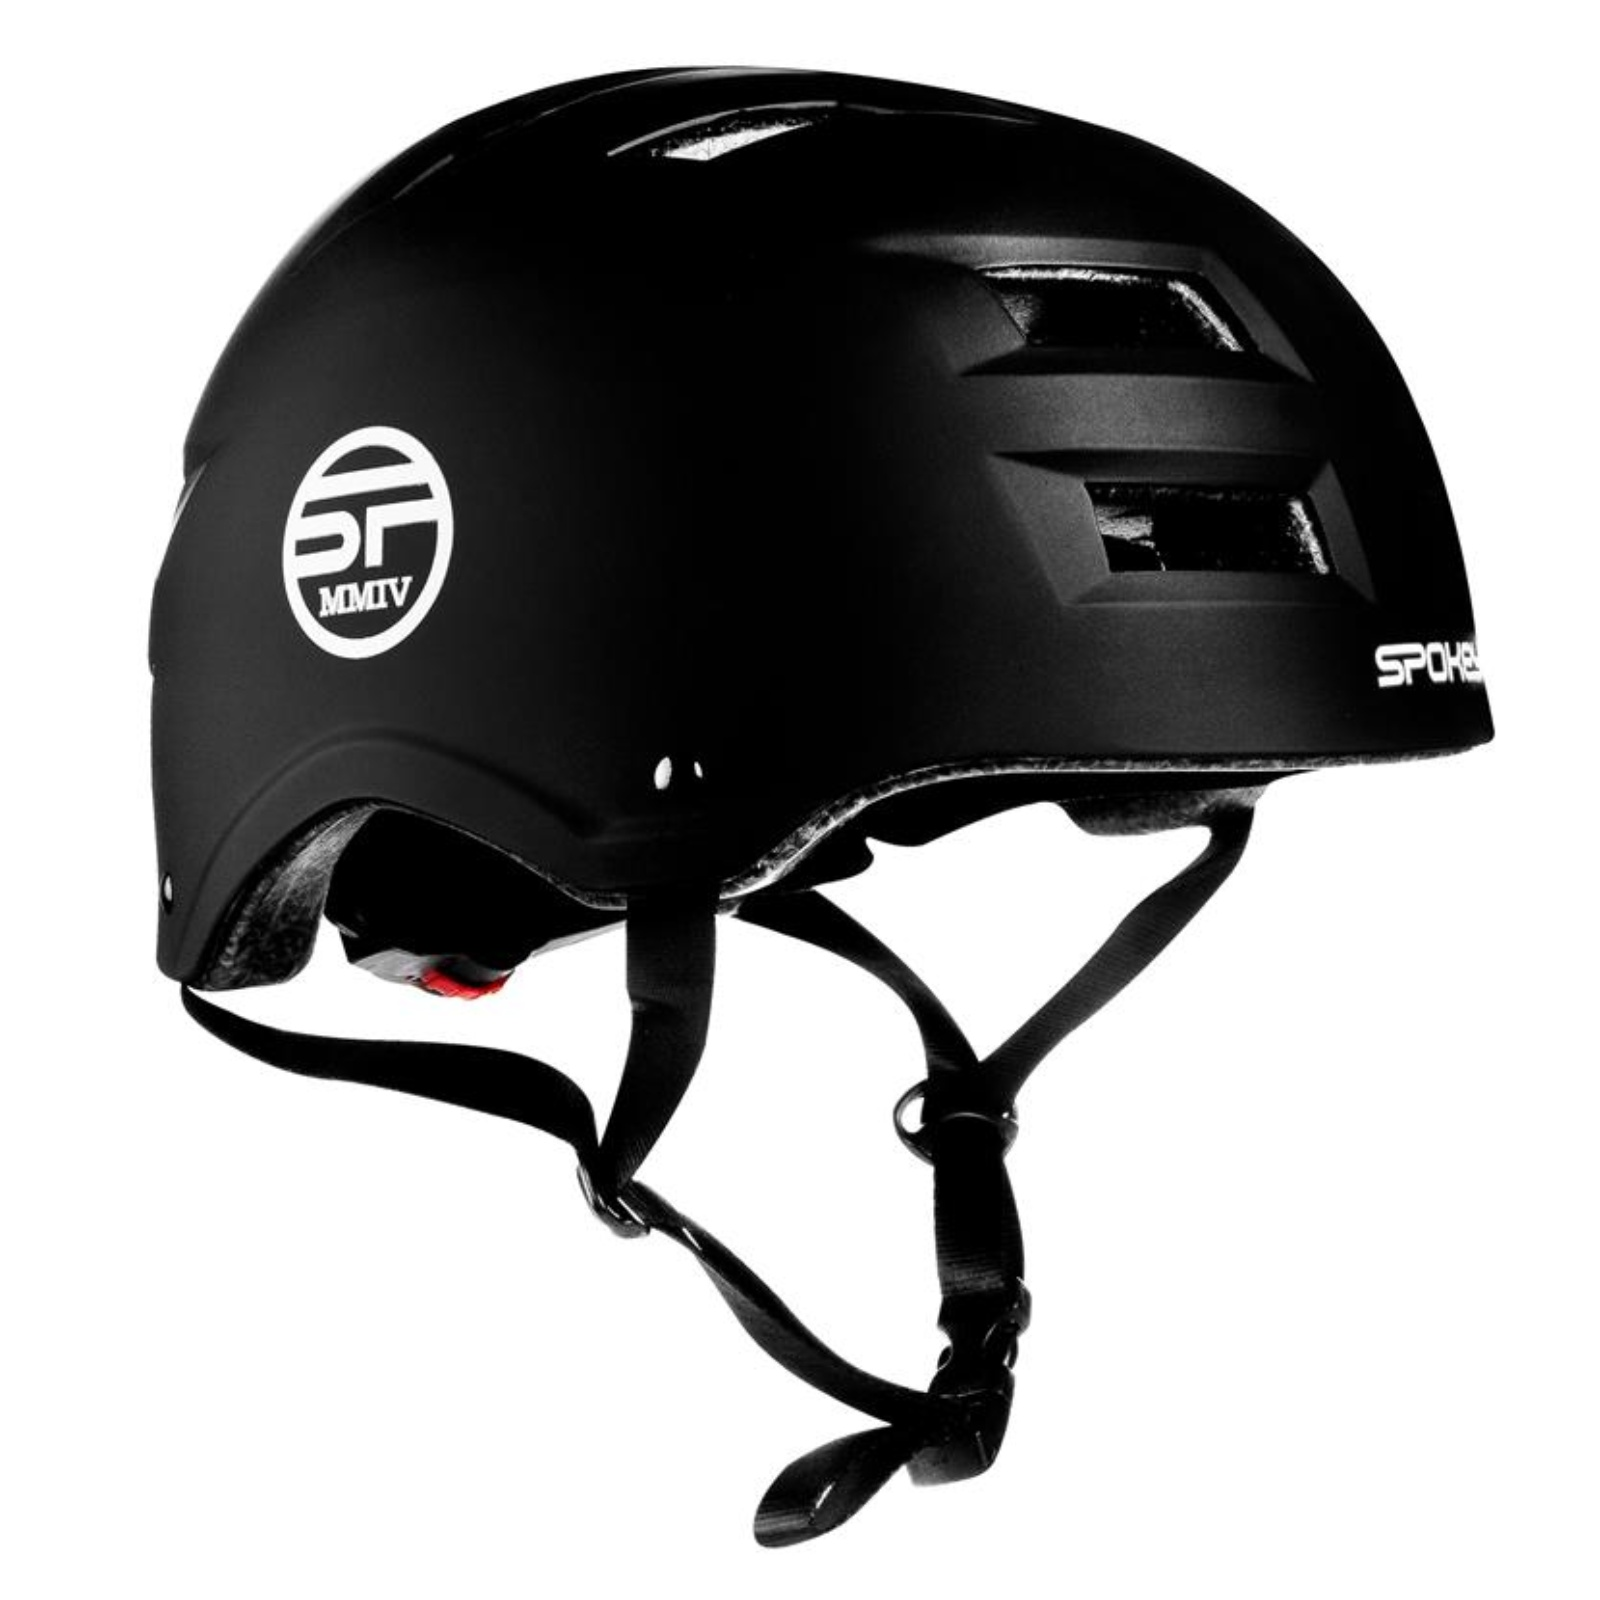 Cyklo přilba SPOKEY Ninja 55-58 cm